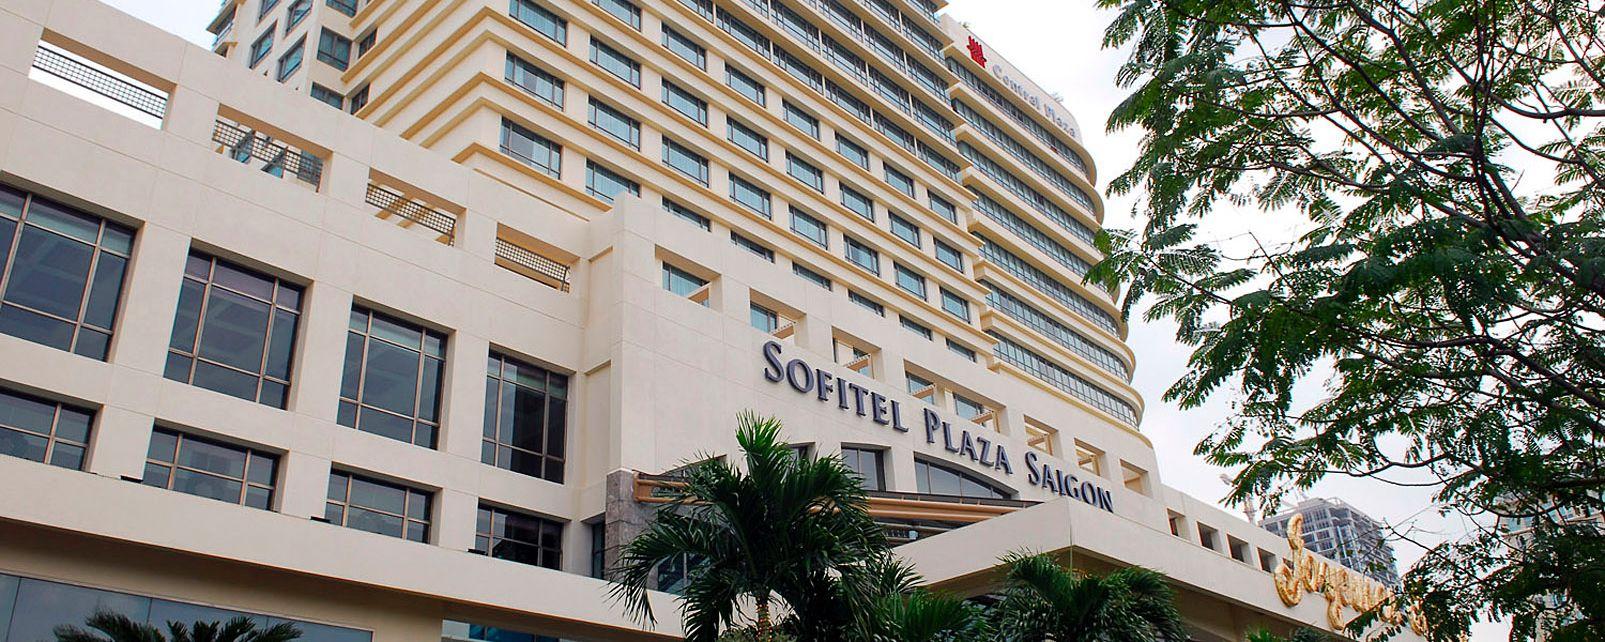 Hotel Sofitel Saigon Plaza